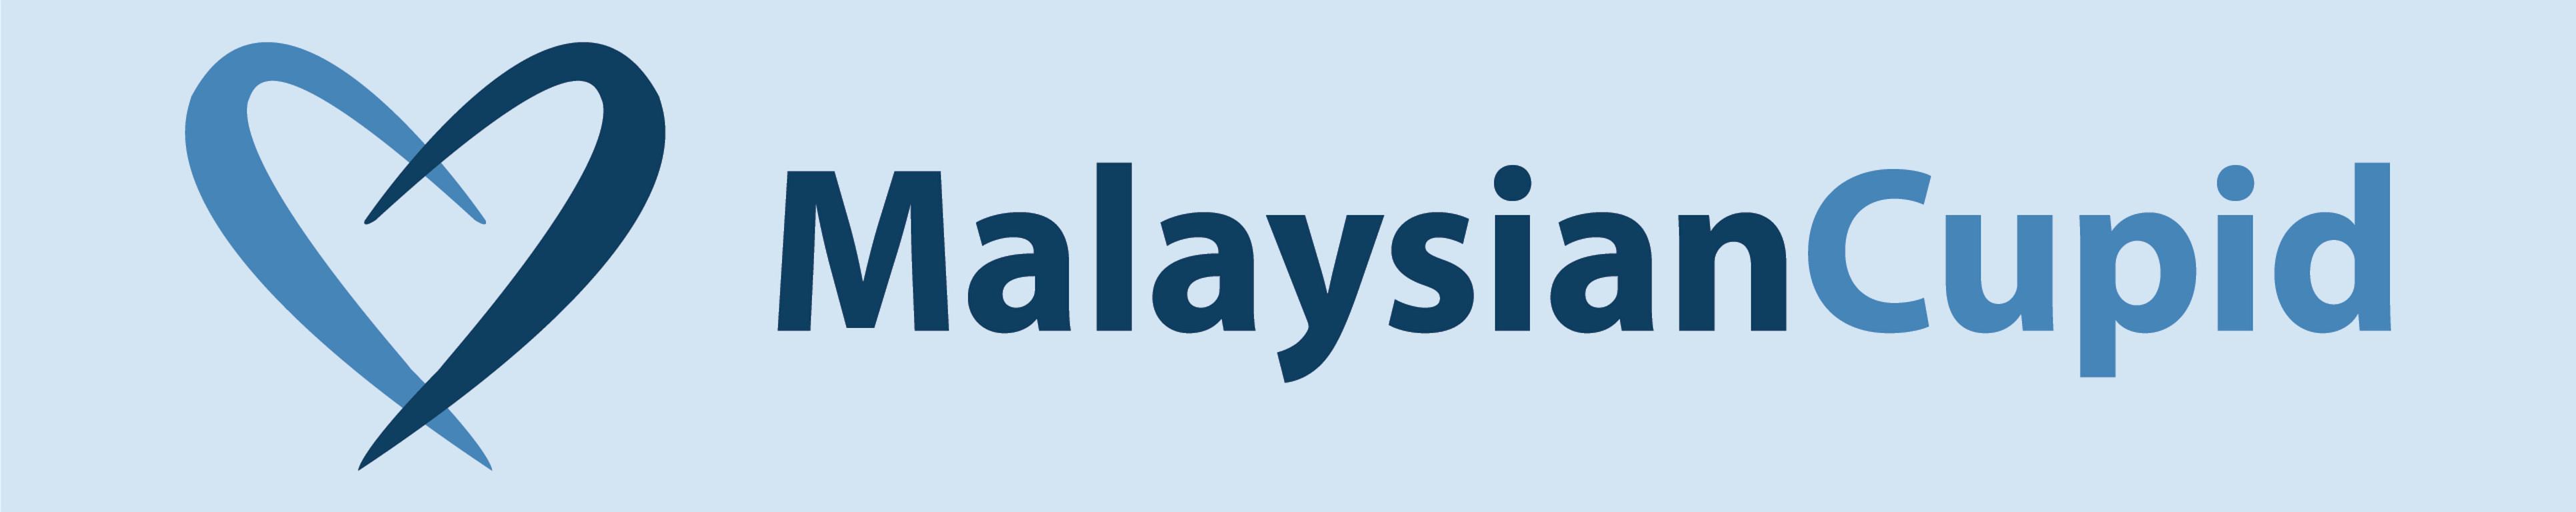 malaysiancupid logo